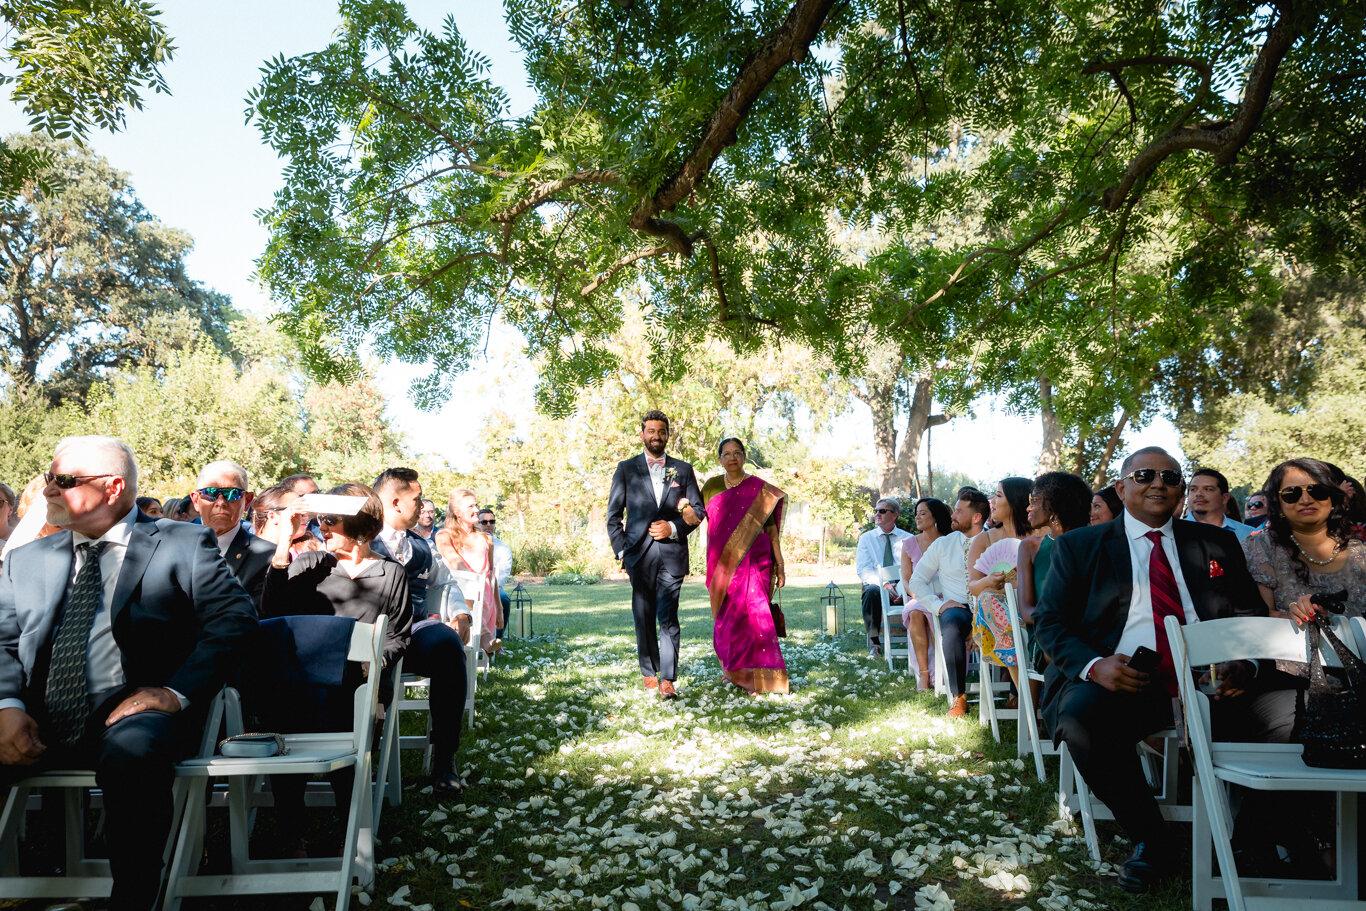 2019.08.24_Emily-Ashir-Wedding-at-the-Maples-5706.jpg